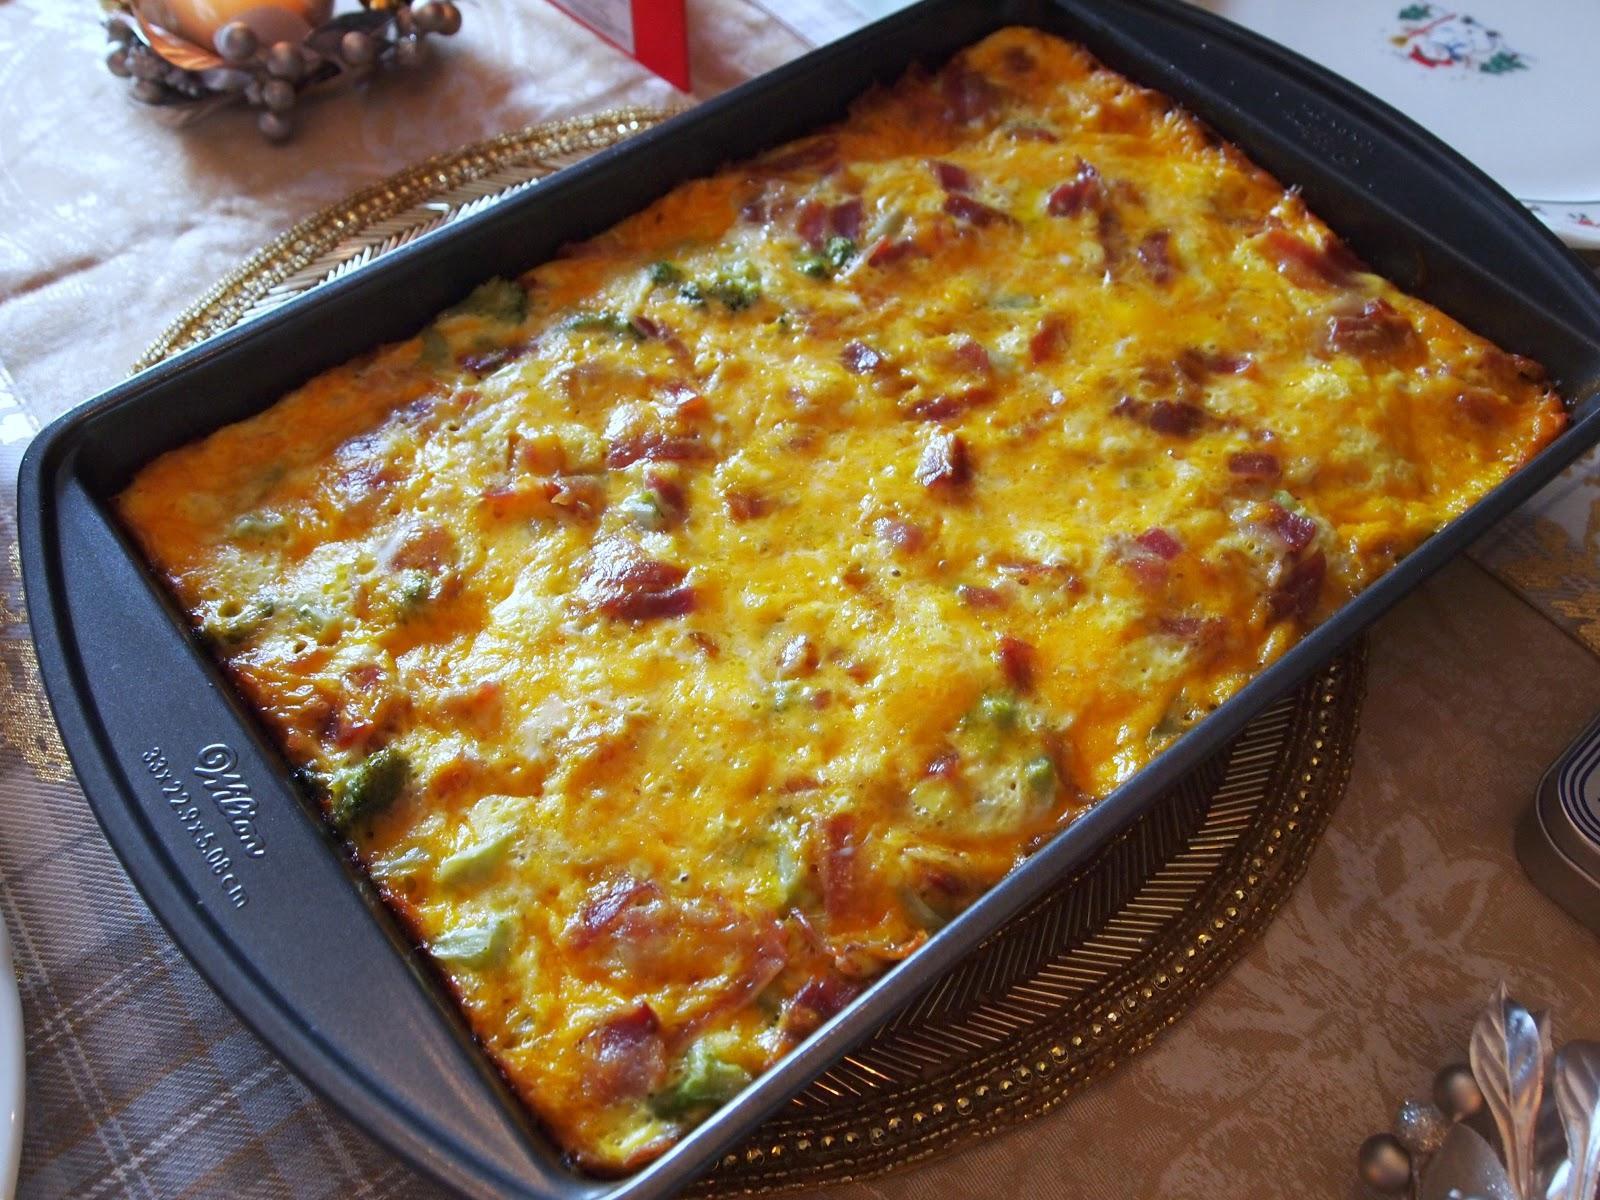 Breakfast Casserole With Tater Tots  Tater Tot Breakfast Casserole Paperblog